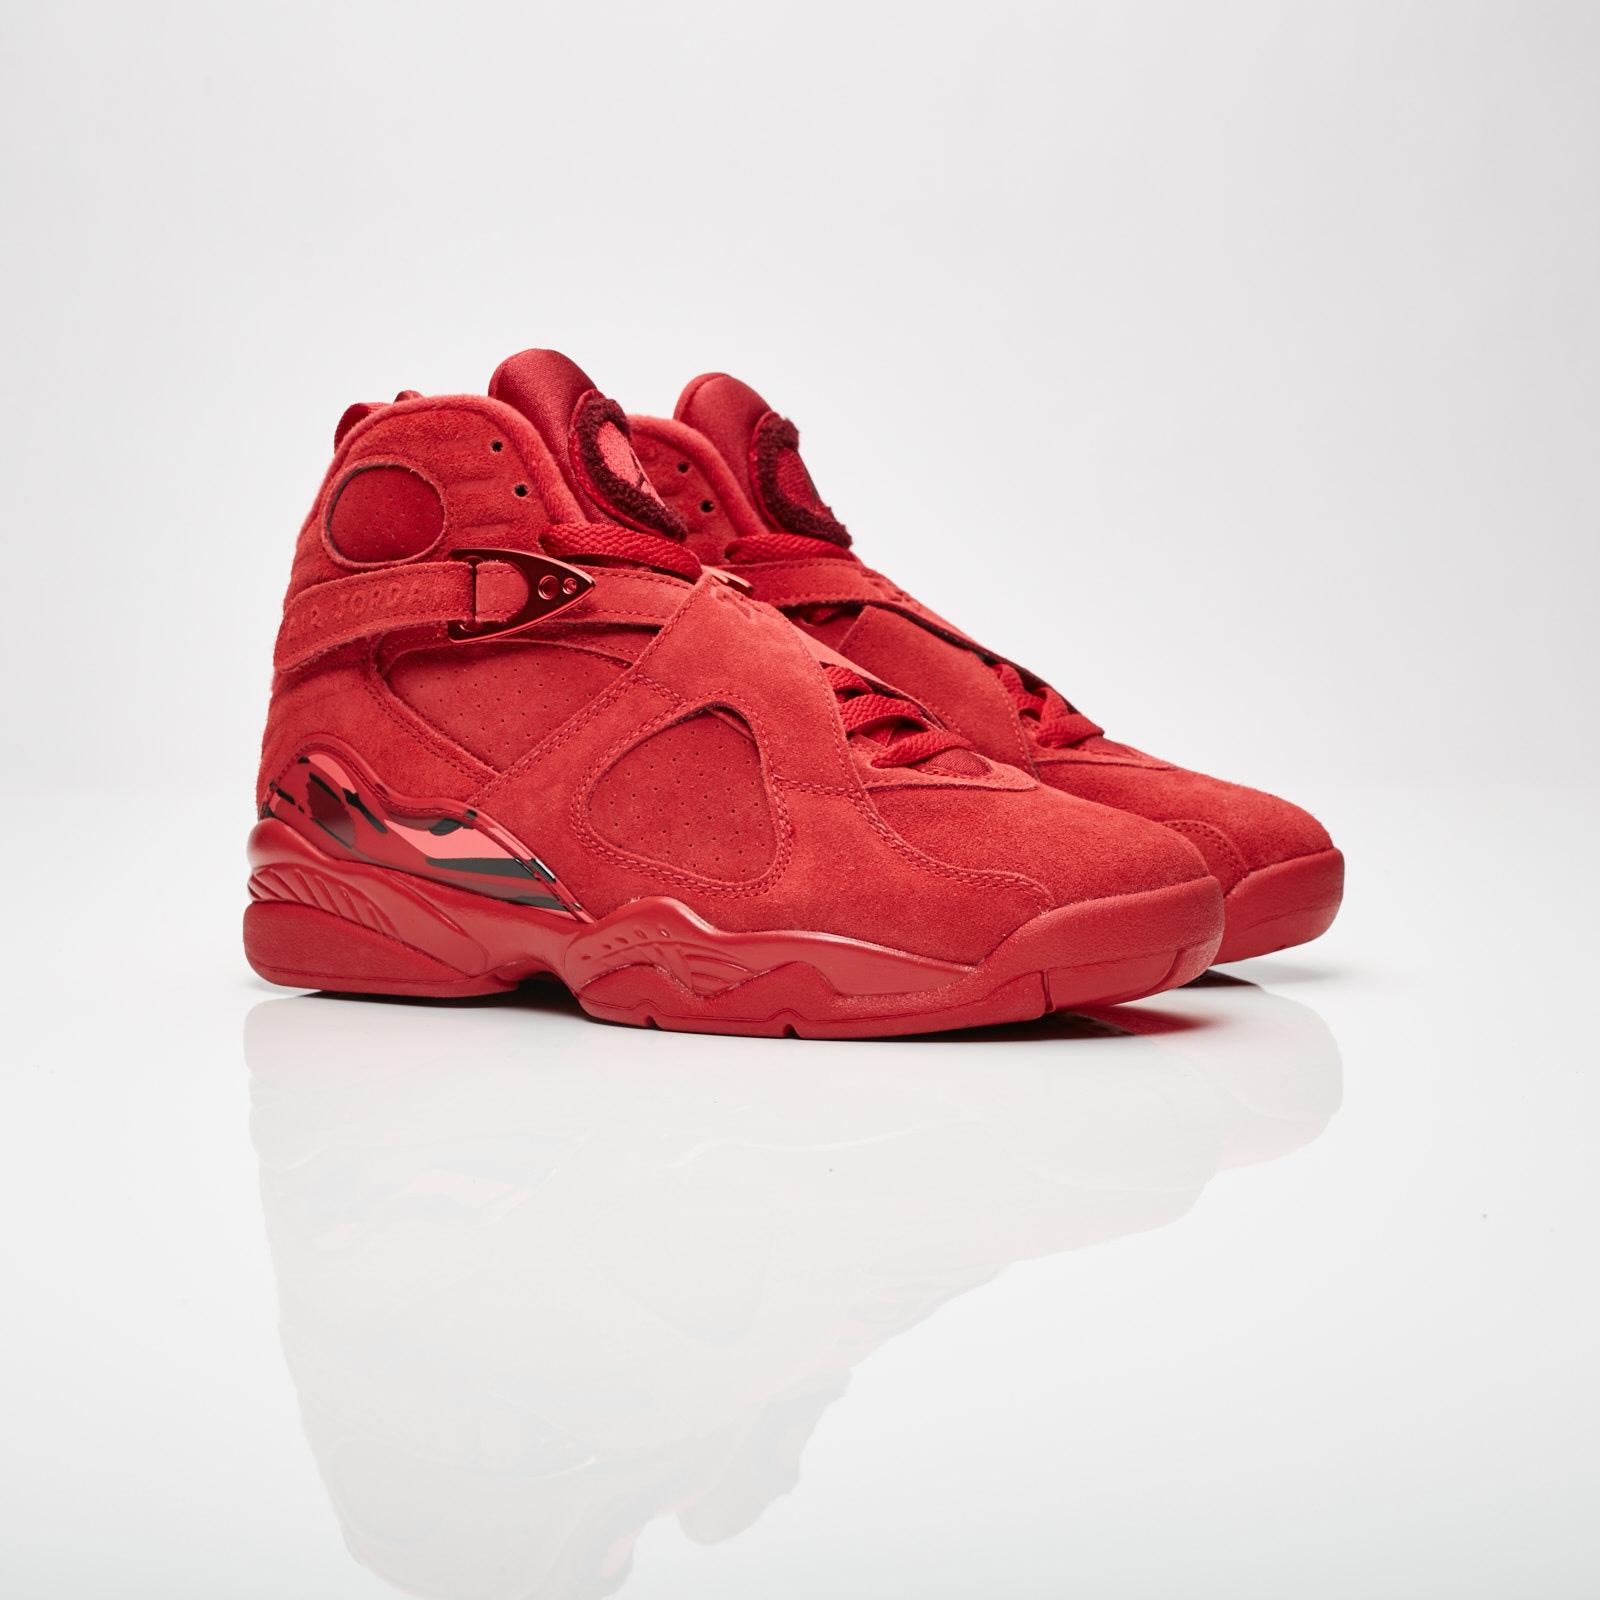 sale retailer 93127 34213 Jordan Brand Wmns Air Jordan 8 Retro Valentines Day - Aq2449 ...